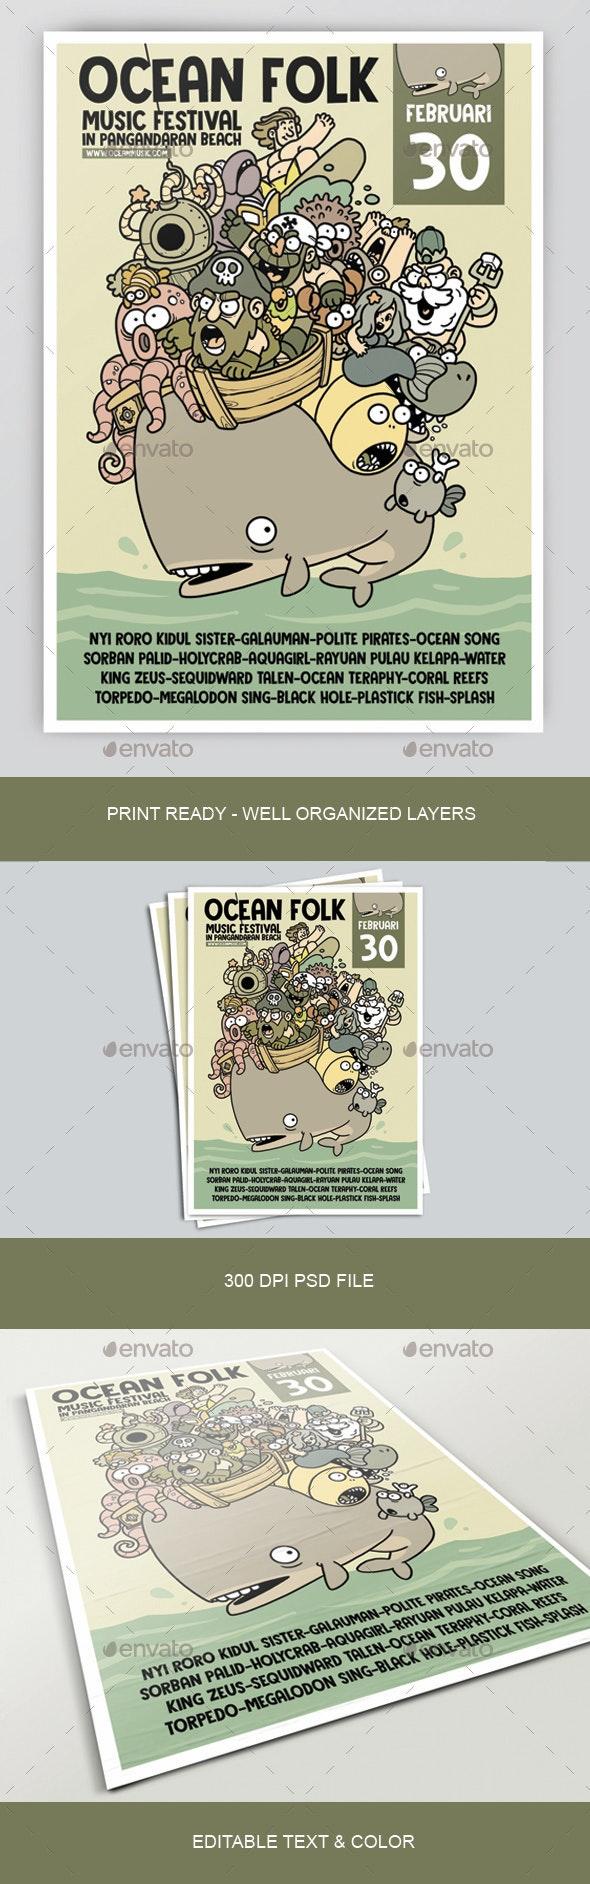 Ocean Folk Poster - Concerts Events